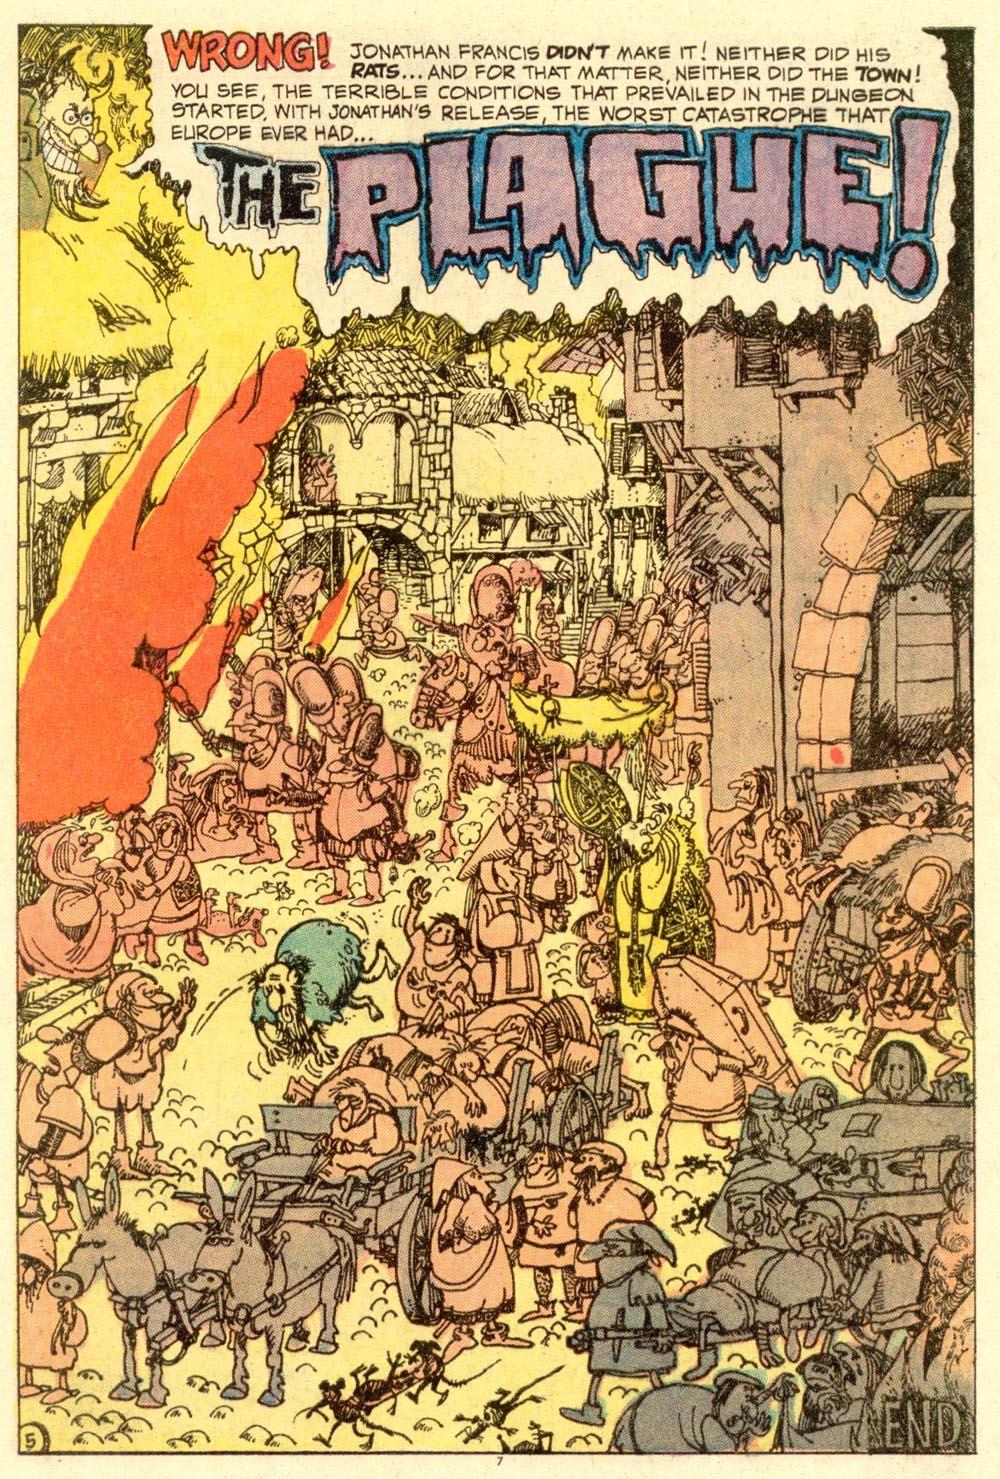 Read online Plop! comic -  Issue #1 - 9